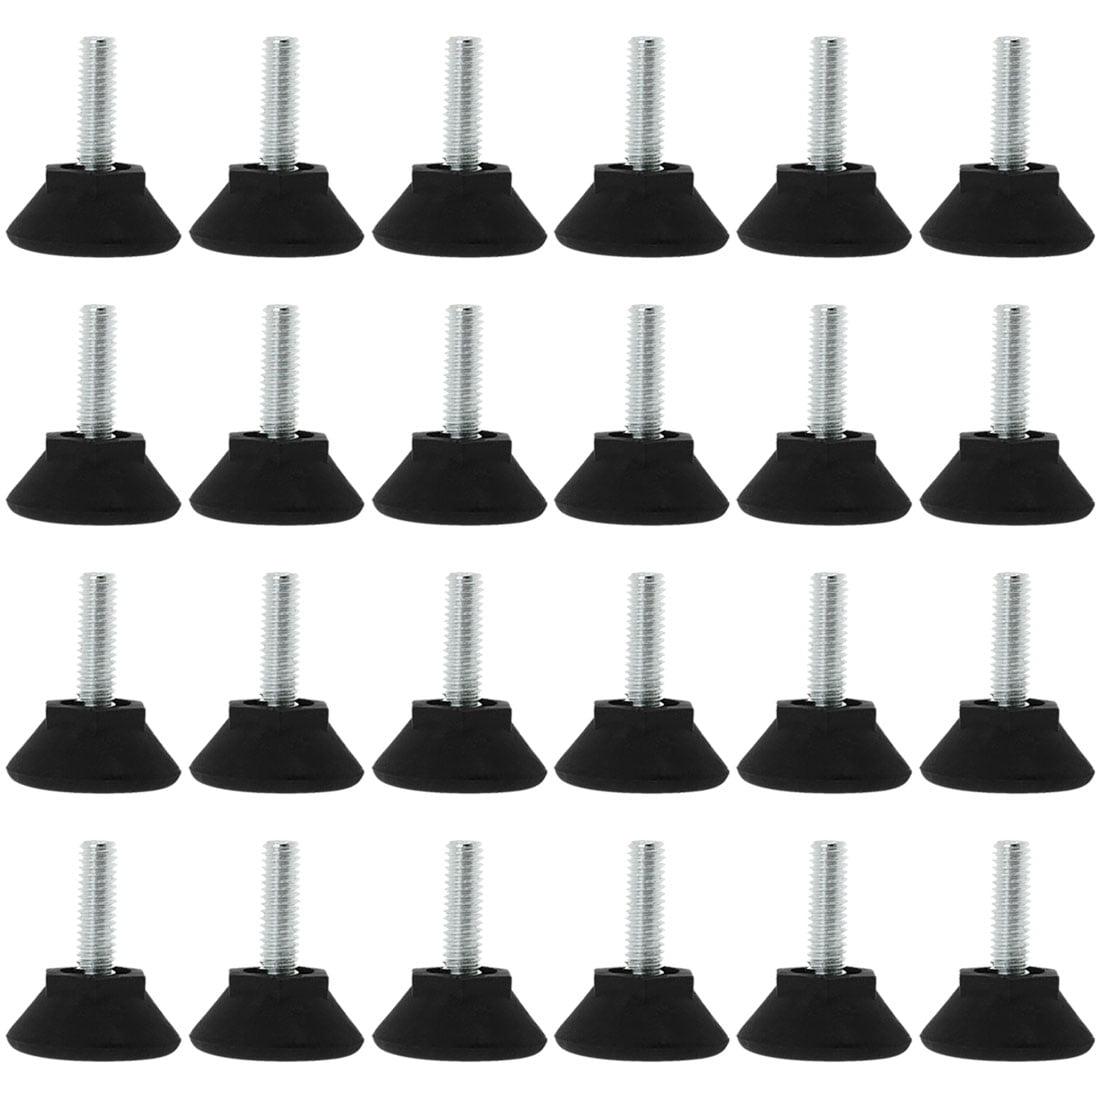 M6 x 20 x 25mm Adjustable Leveling Feet Floor Protector for Table Leg 24pcs - image 7 de 7